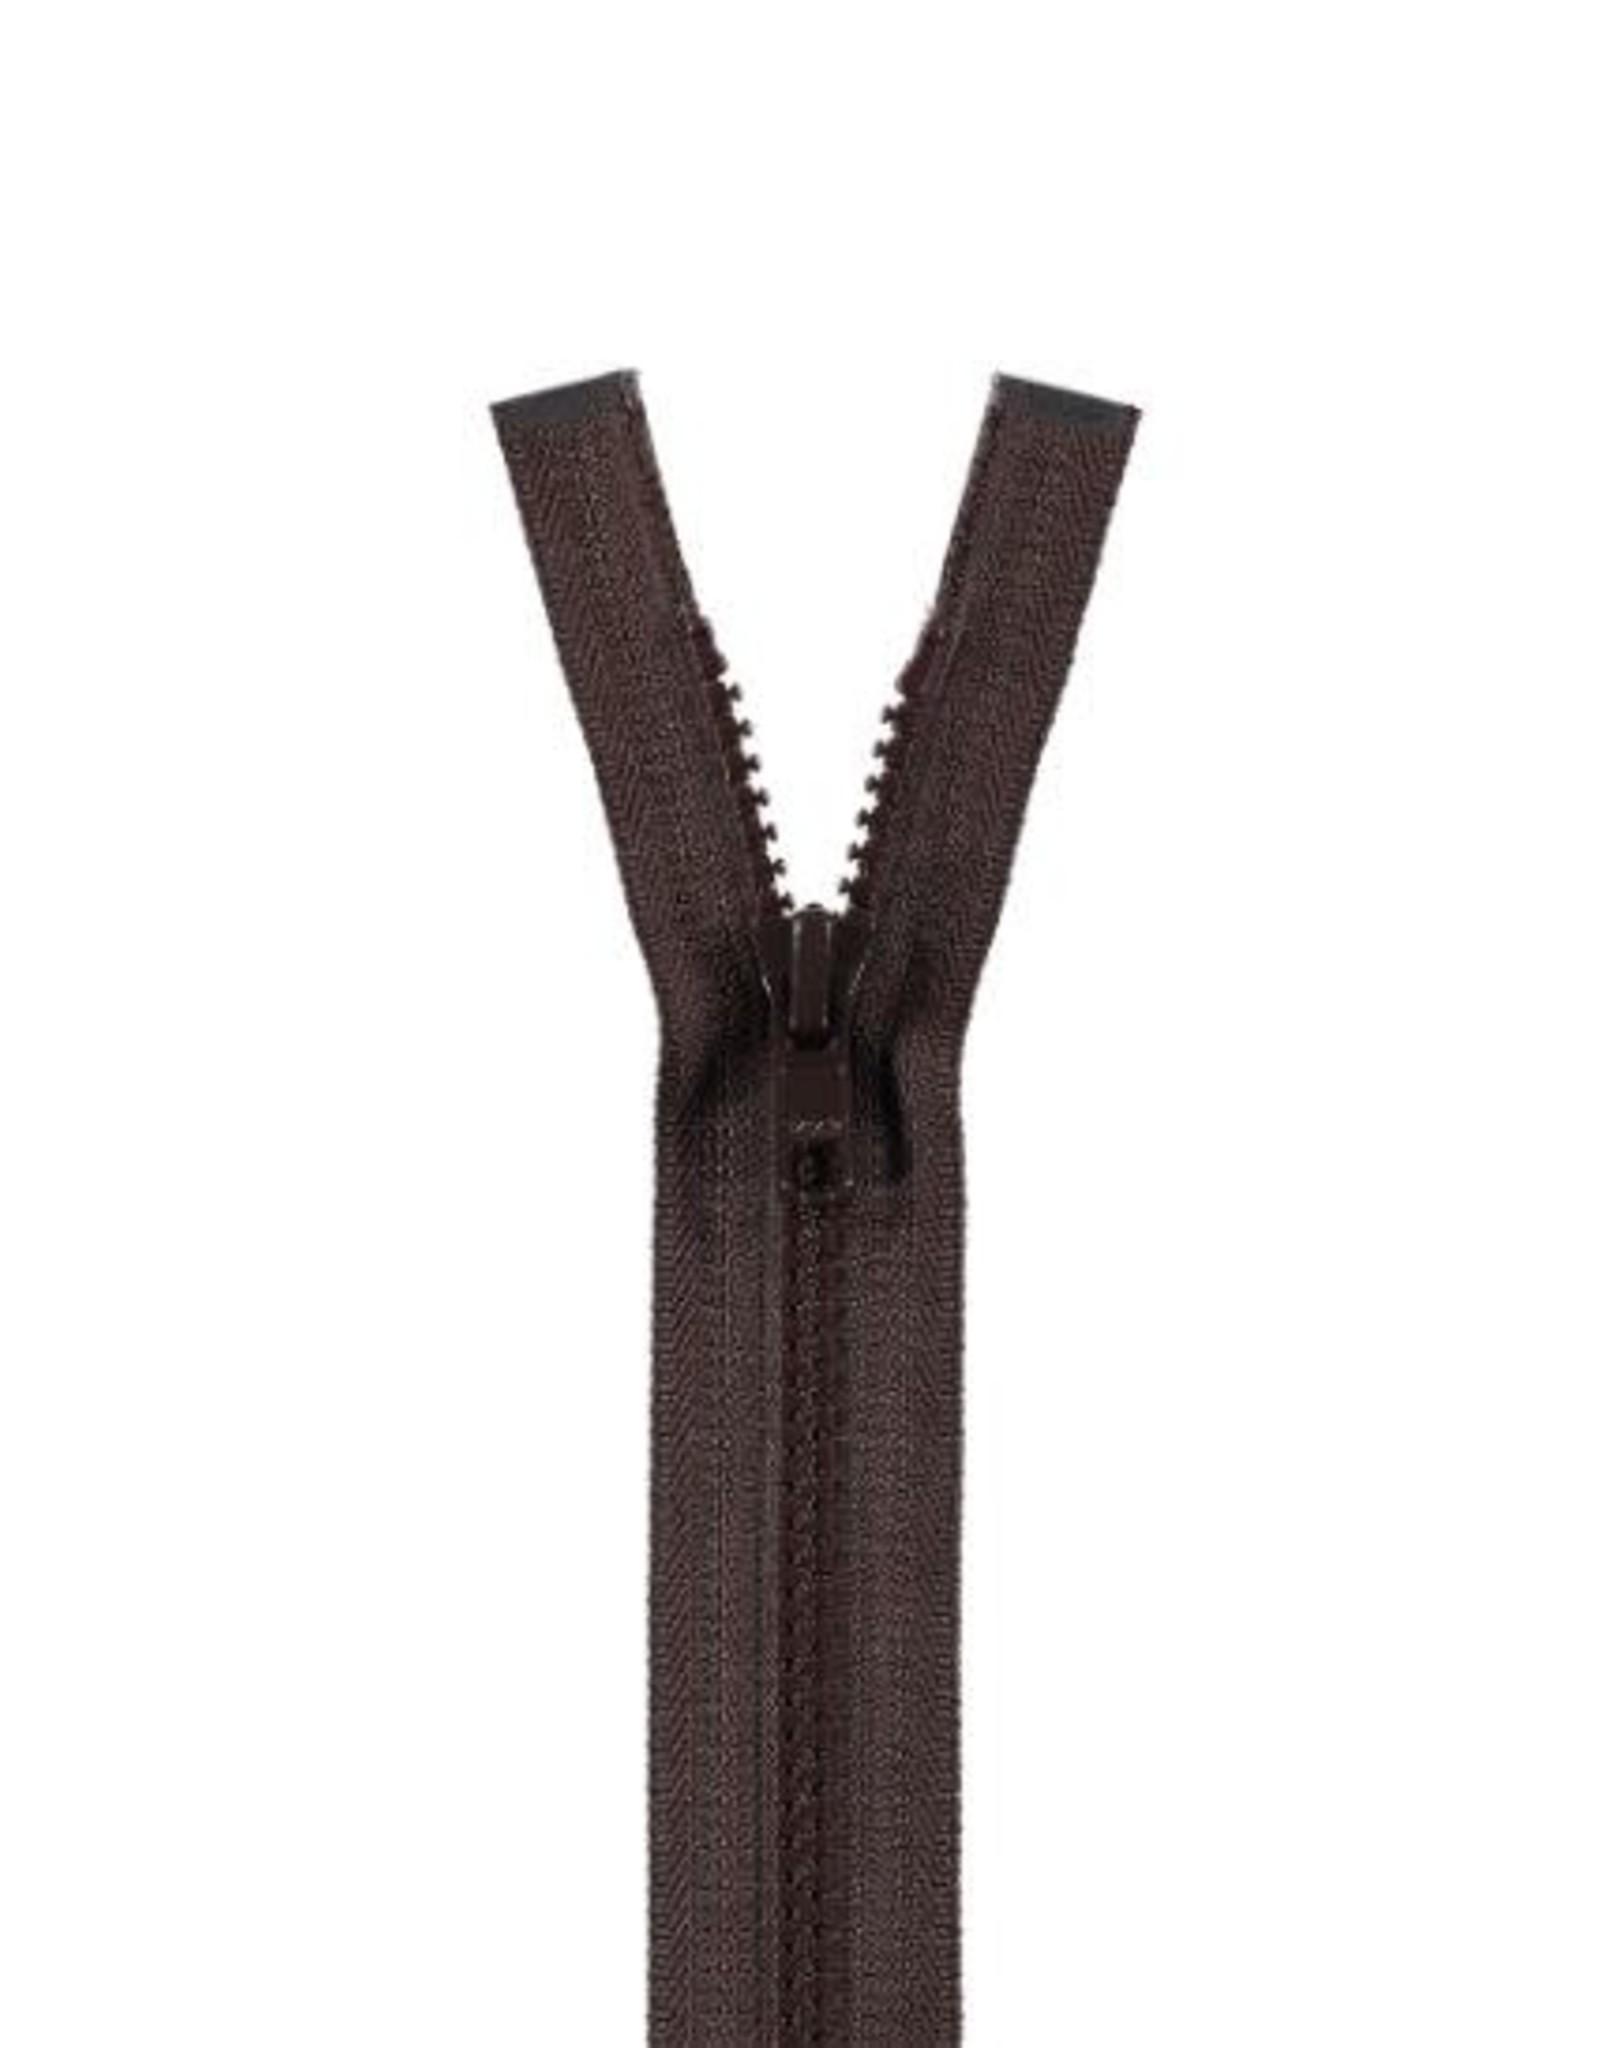 YKK BLOKRITS 5 DEELBAAR bruin 570-65cm